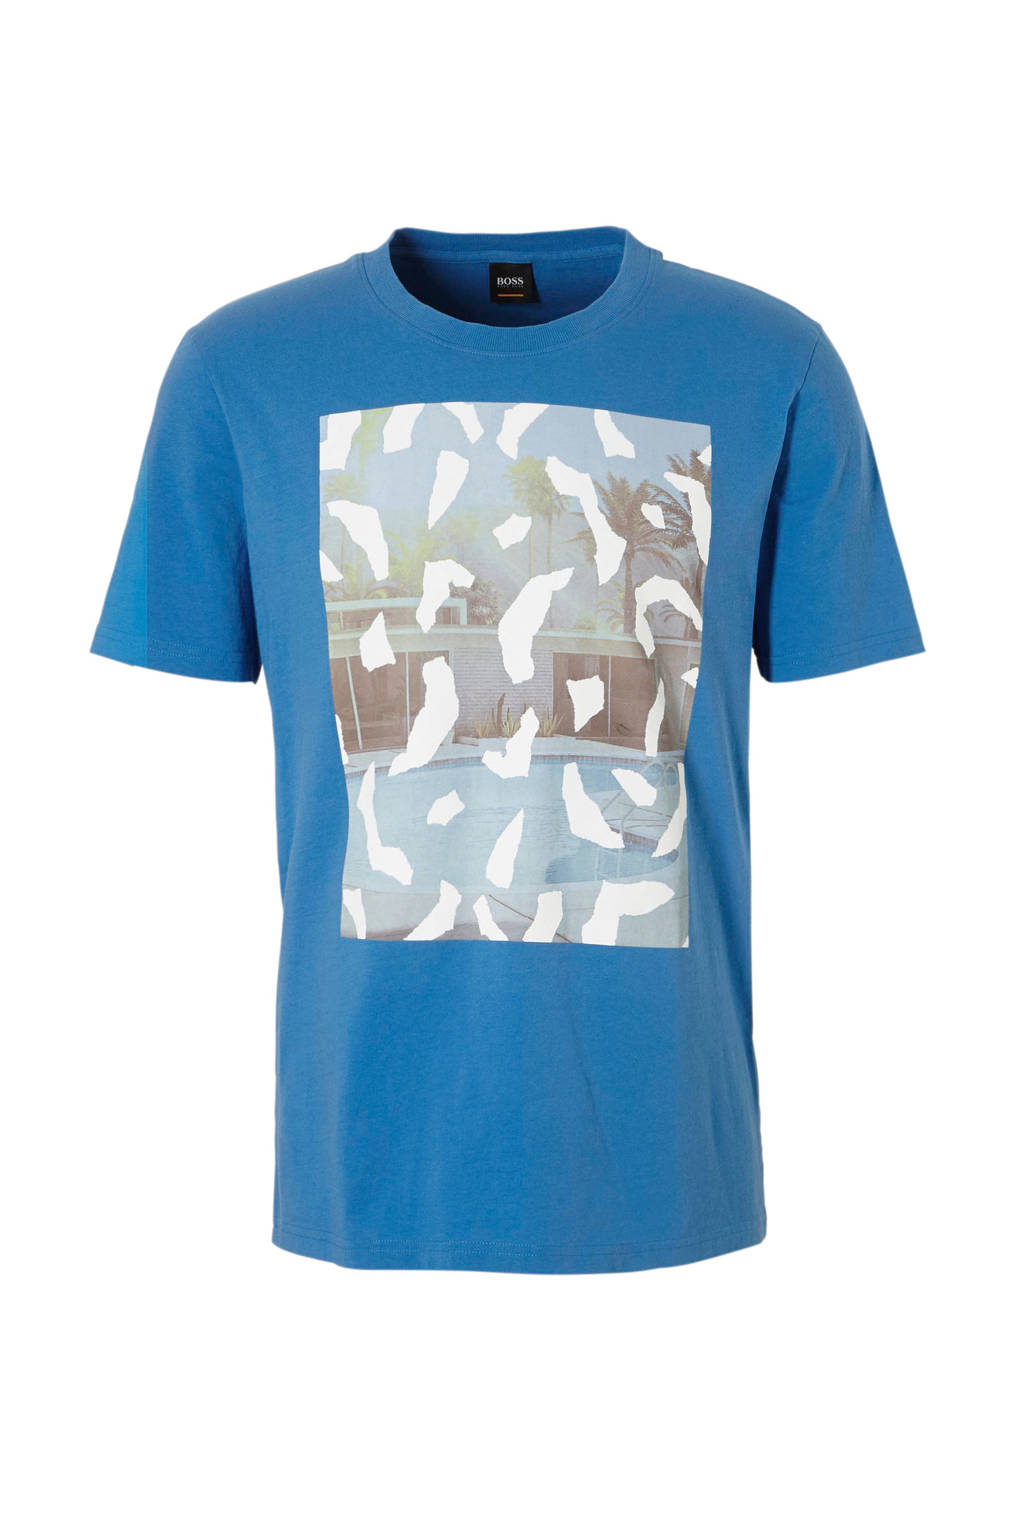 Boss Casual T-shirt, Blauw